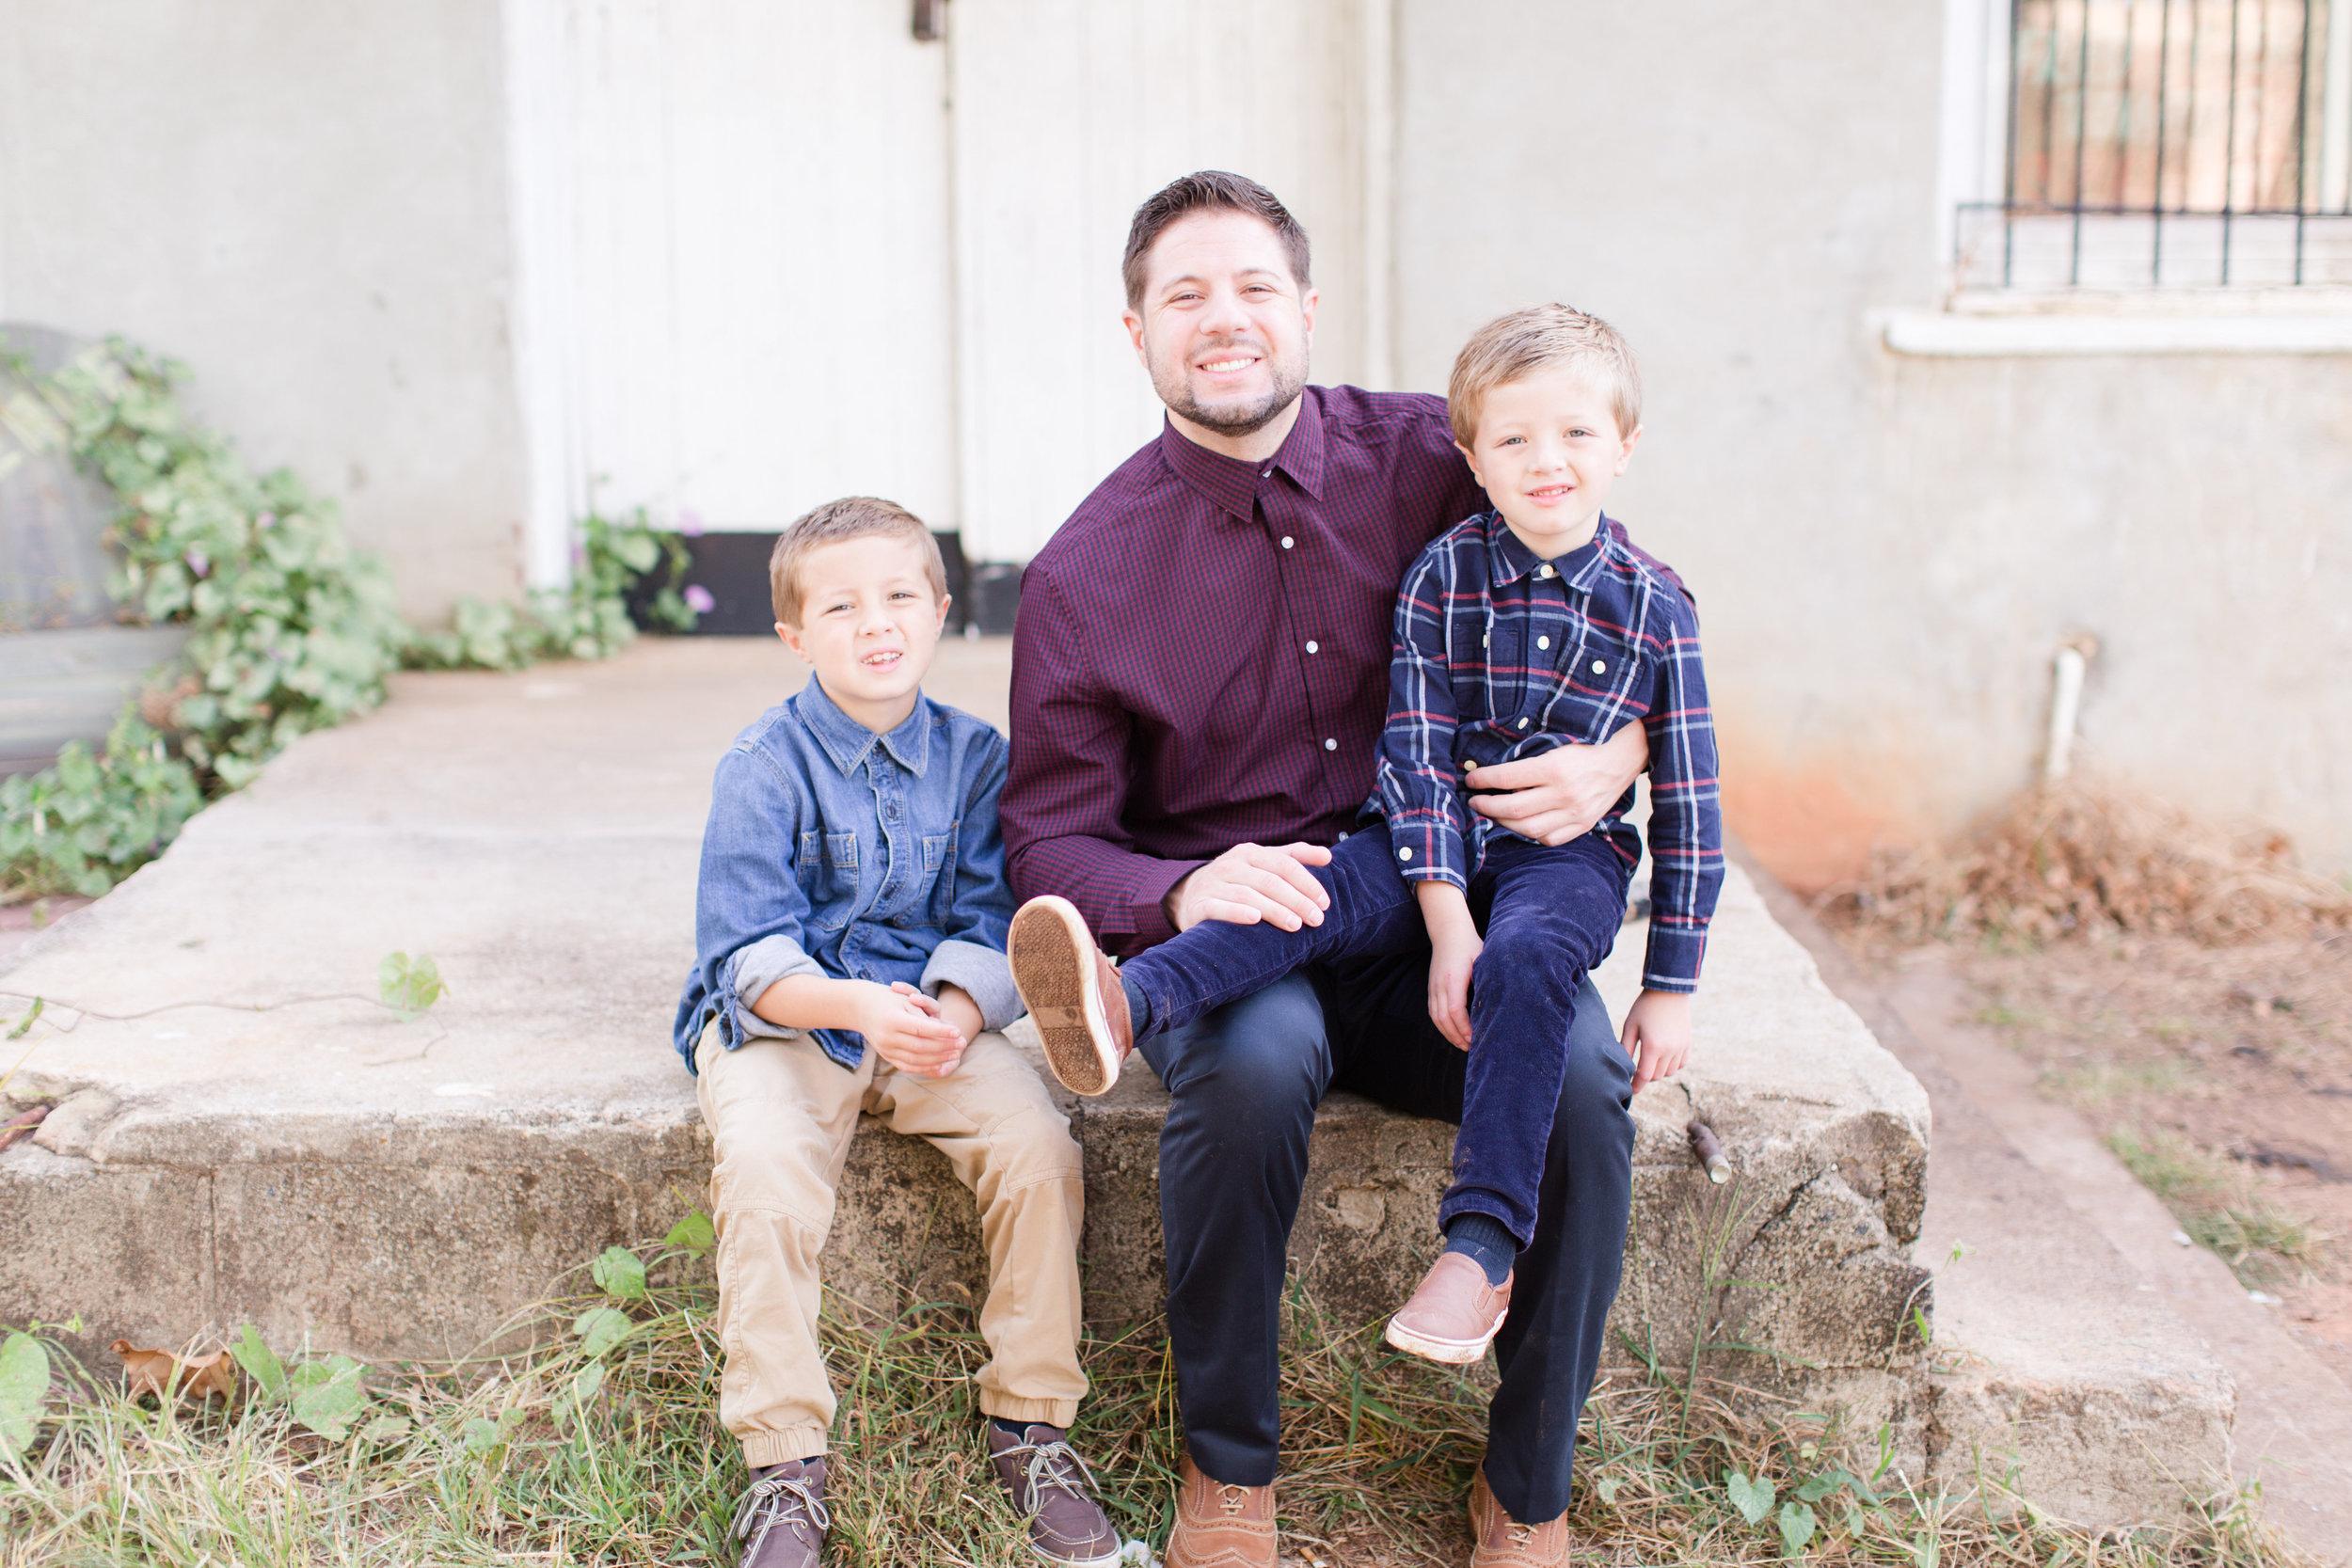 The Day Family-Day Family-0164.jpg